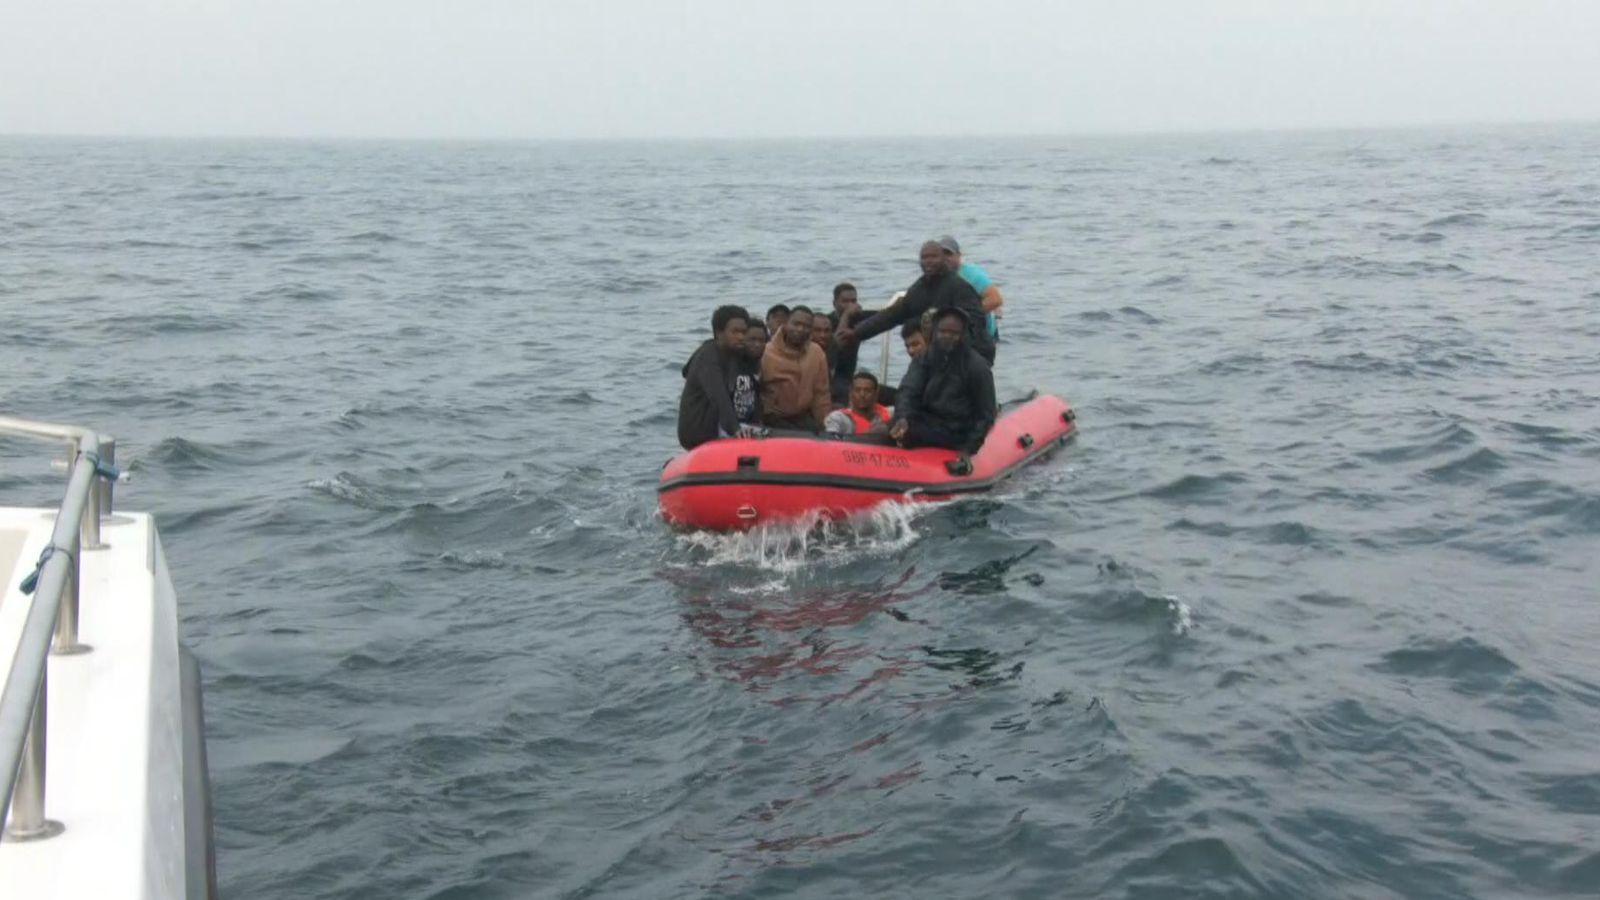 skynews channel migrants 5064525 jpg?20200811092410.'